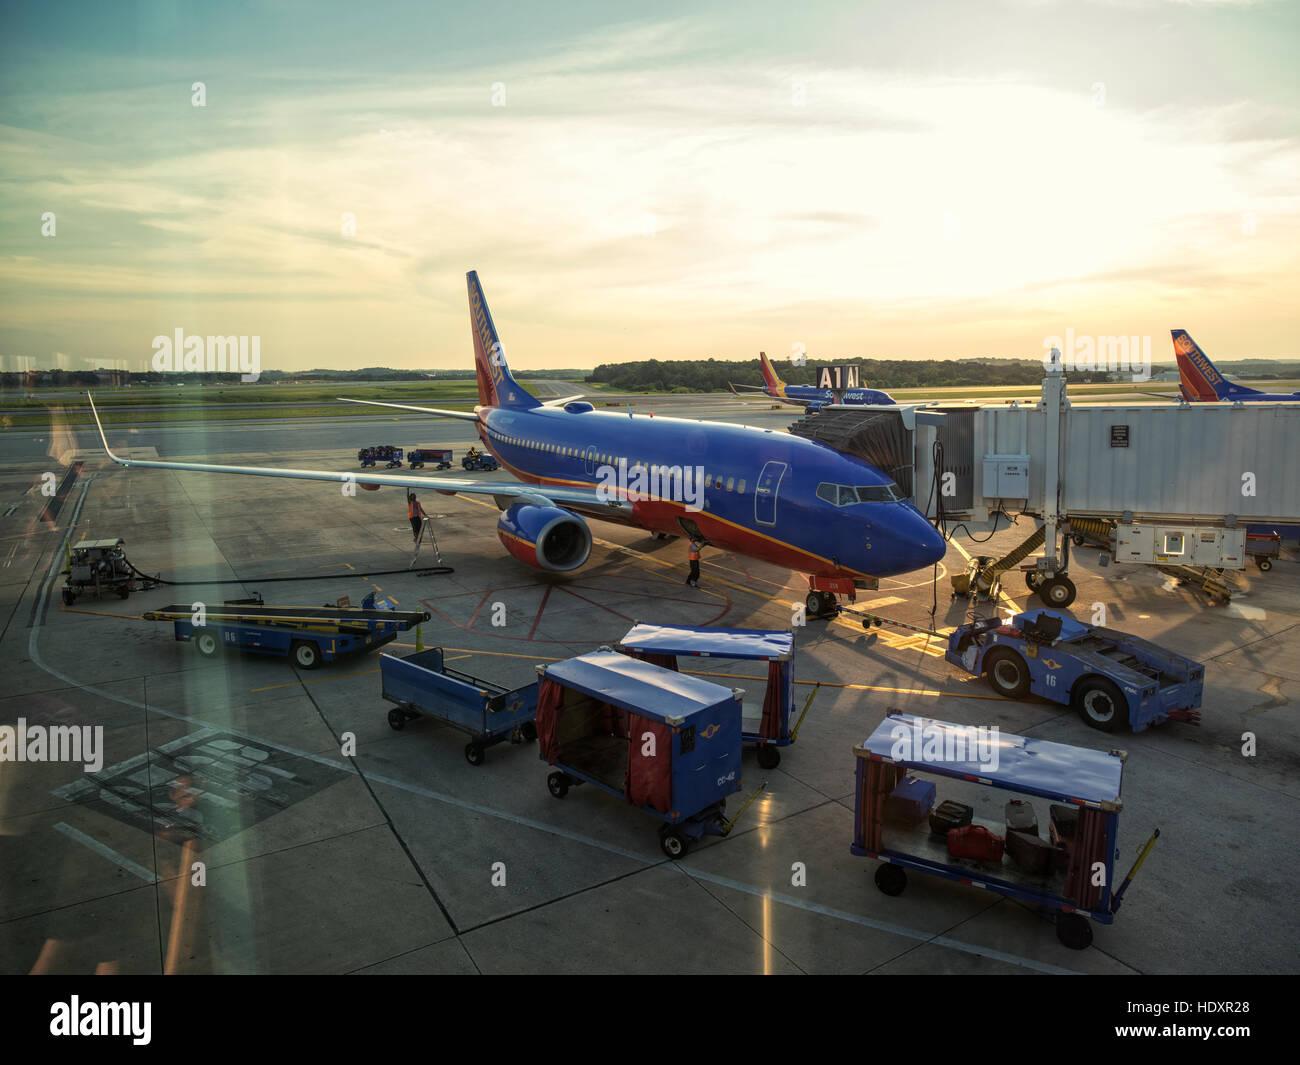 Airplane at an airport terminal gate preparing for an early flight. Baltimore Washington International, BWI. - Stock Image